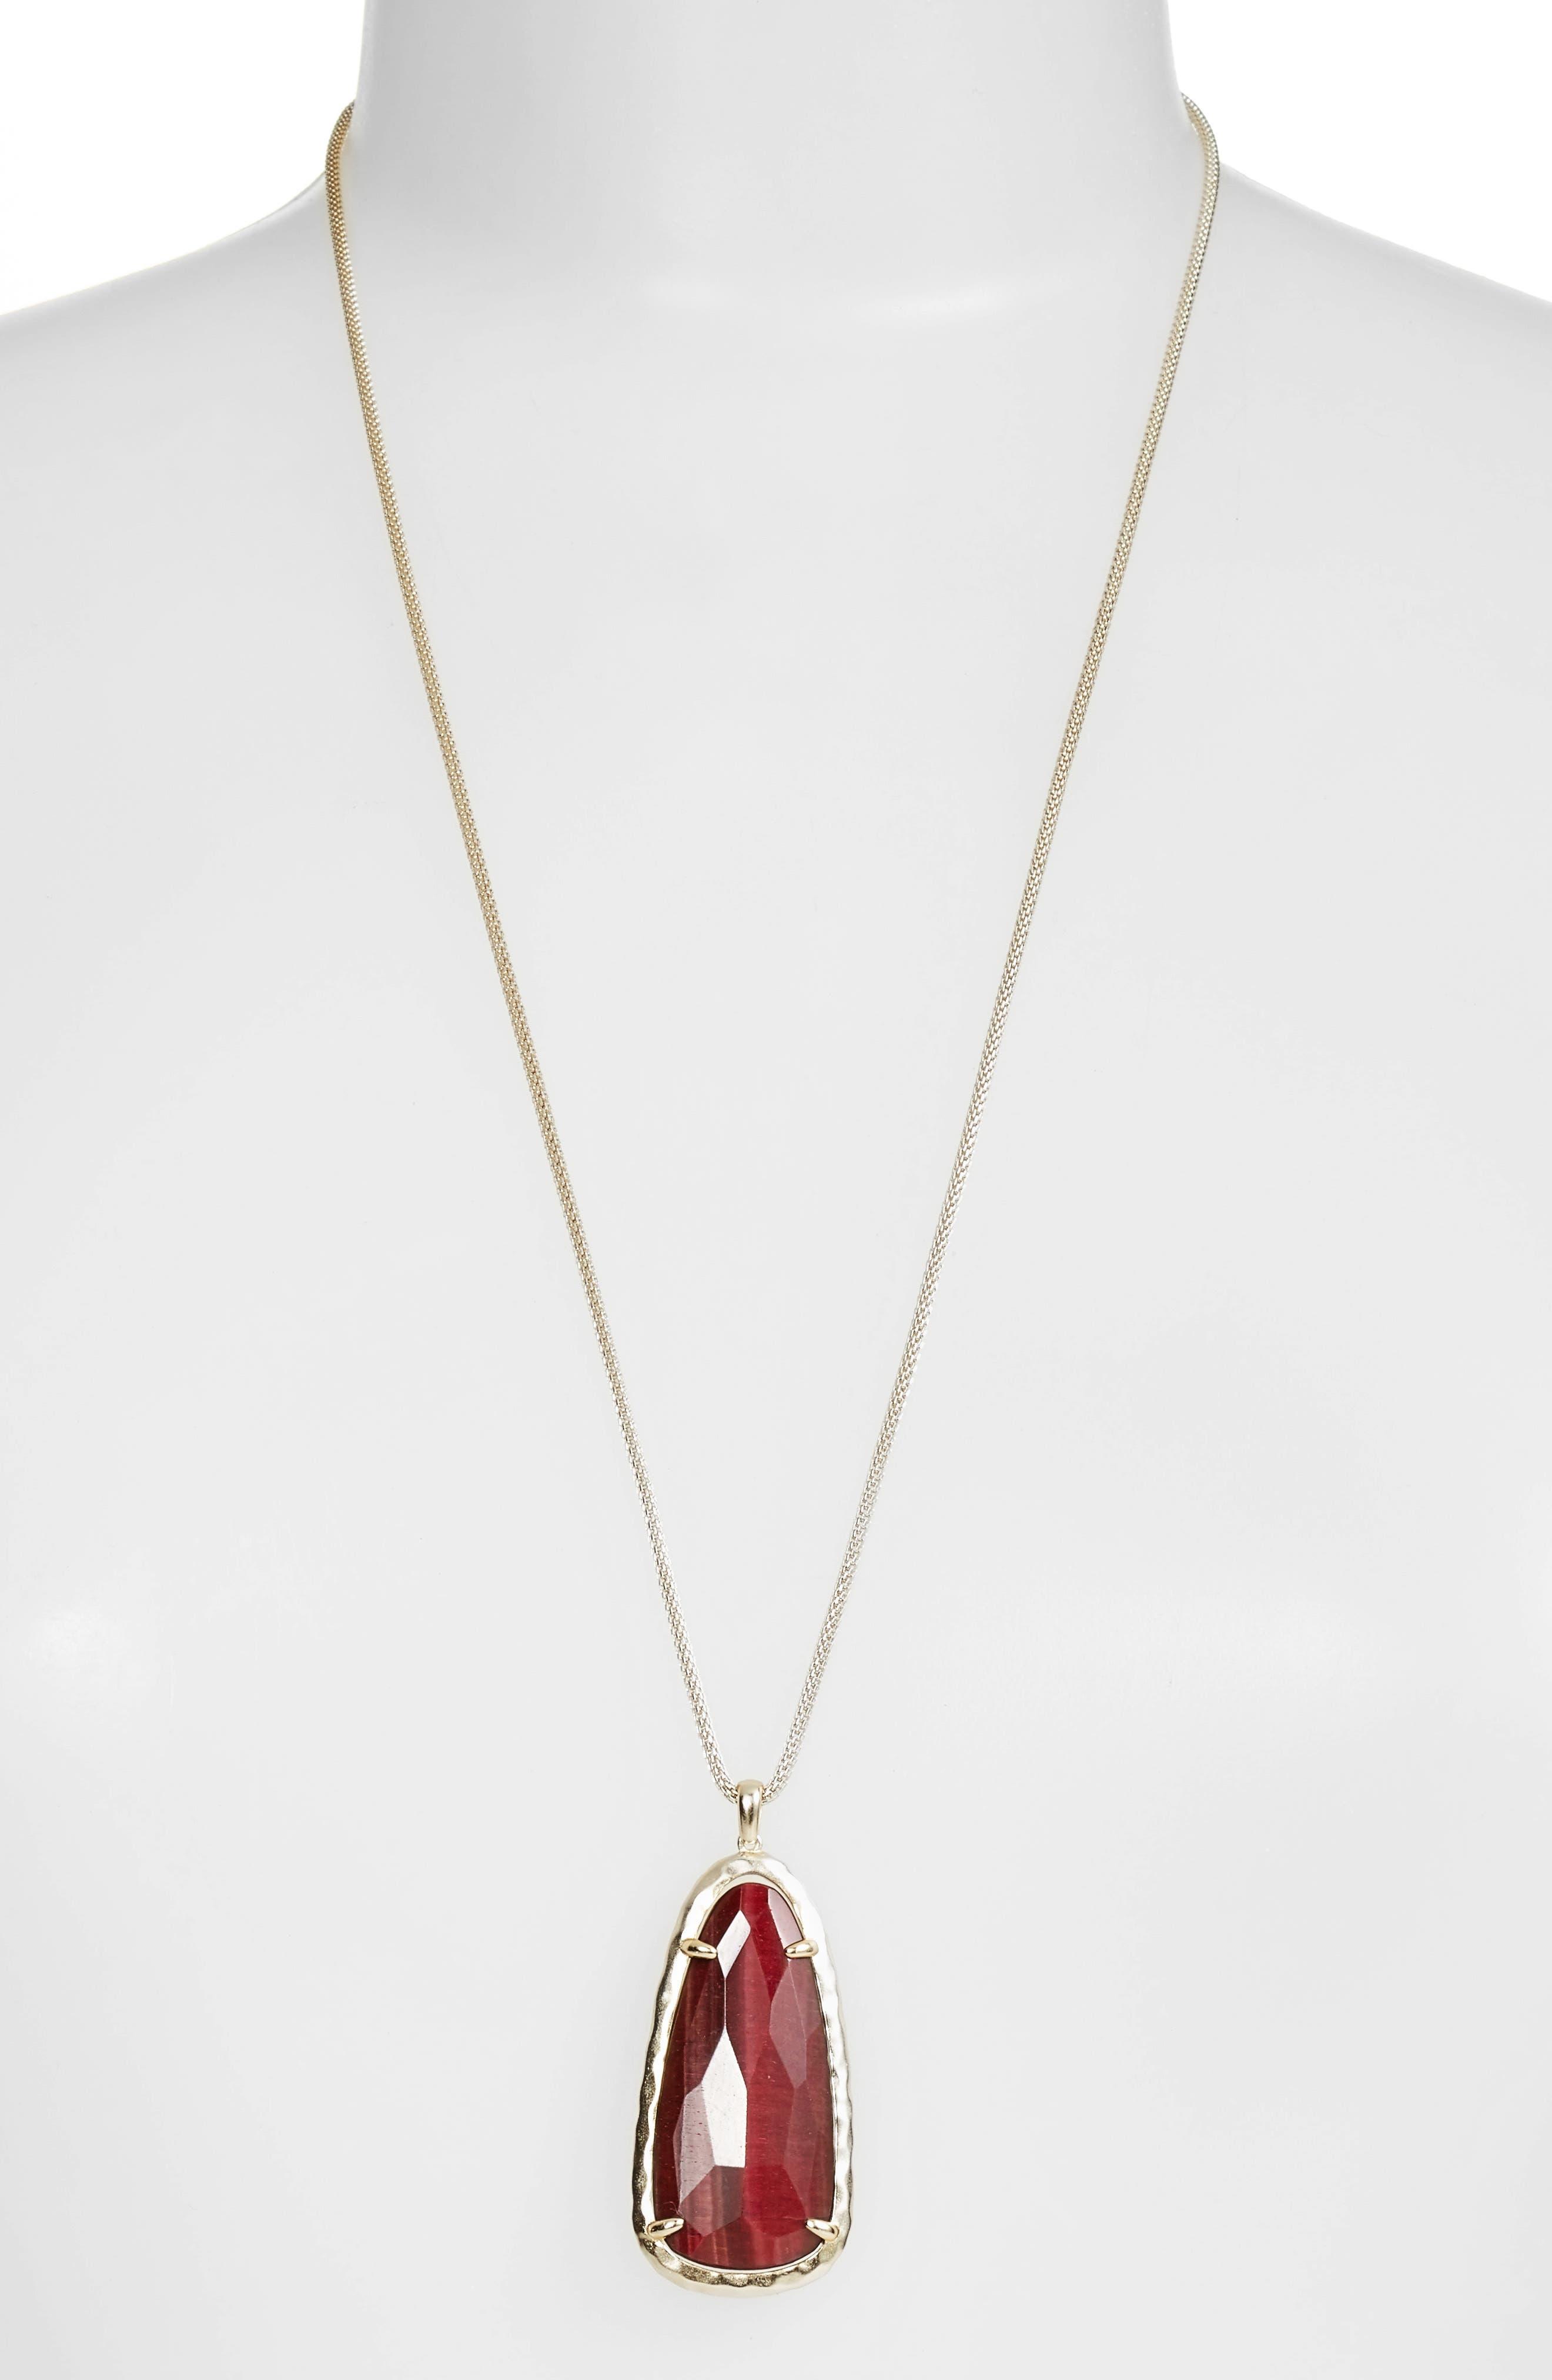 Main Image - Kendra Scott Saylor Pendant Necklace